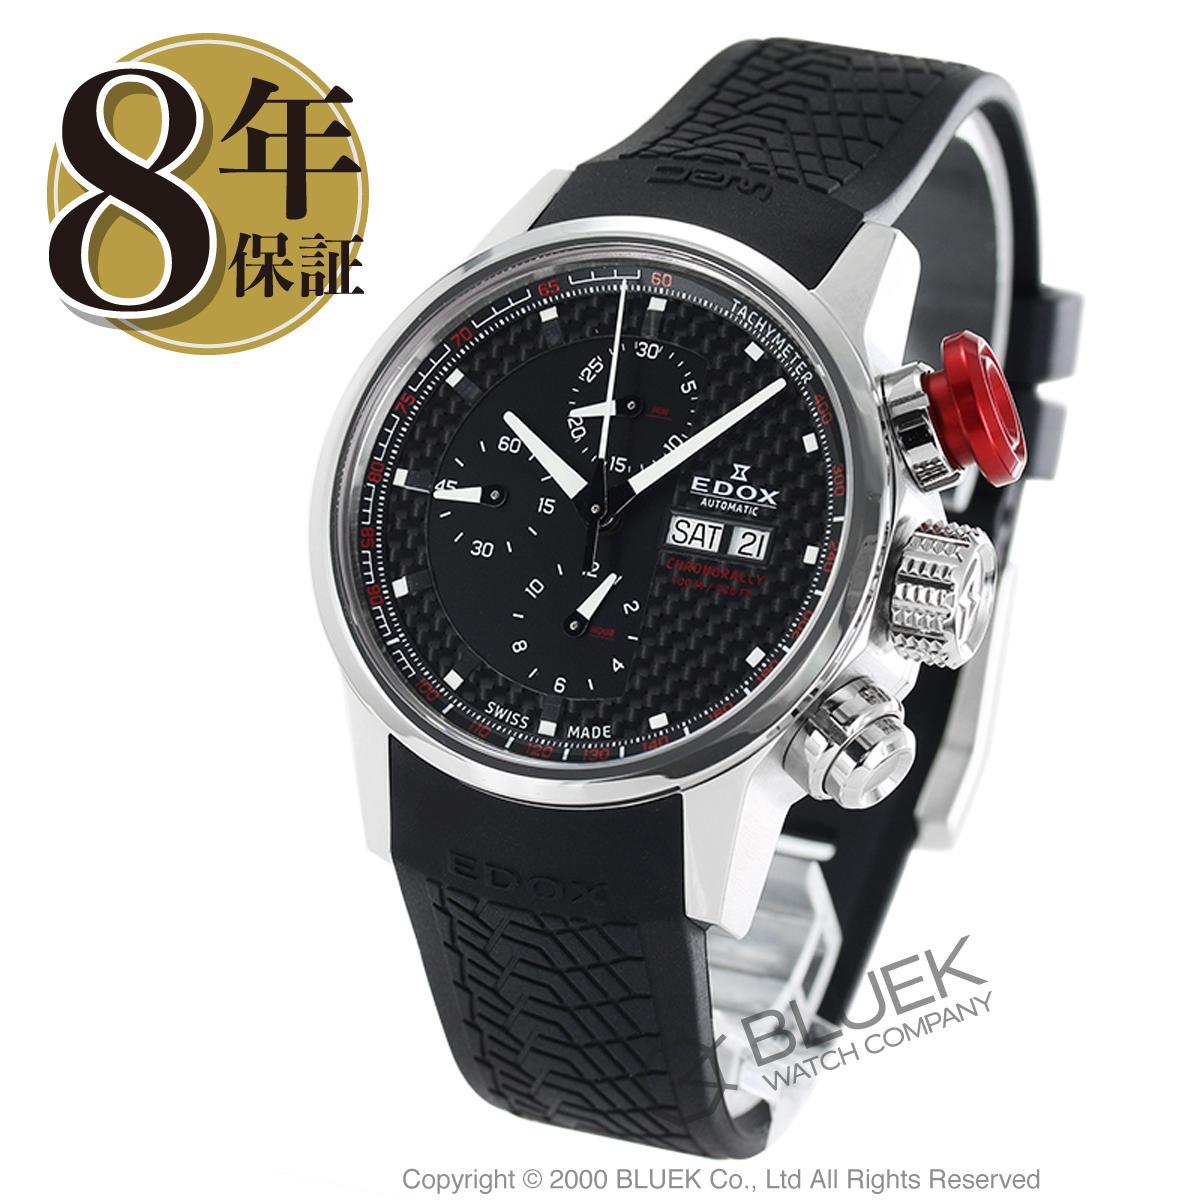 2565d52023a1 エドックス WRC クロノラリー クロノグラフ 腕時計 メンズ EDOX 01112-3-NIN-R_8 [送料無料][対応][エドックス ][01112-3-NIN-R][EDOX][時計][新品]